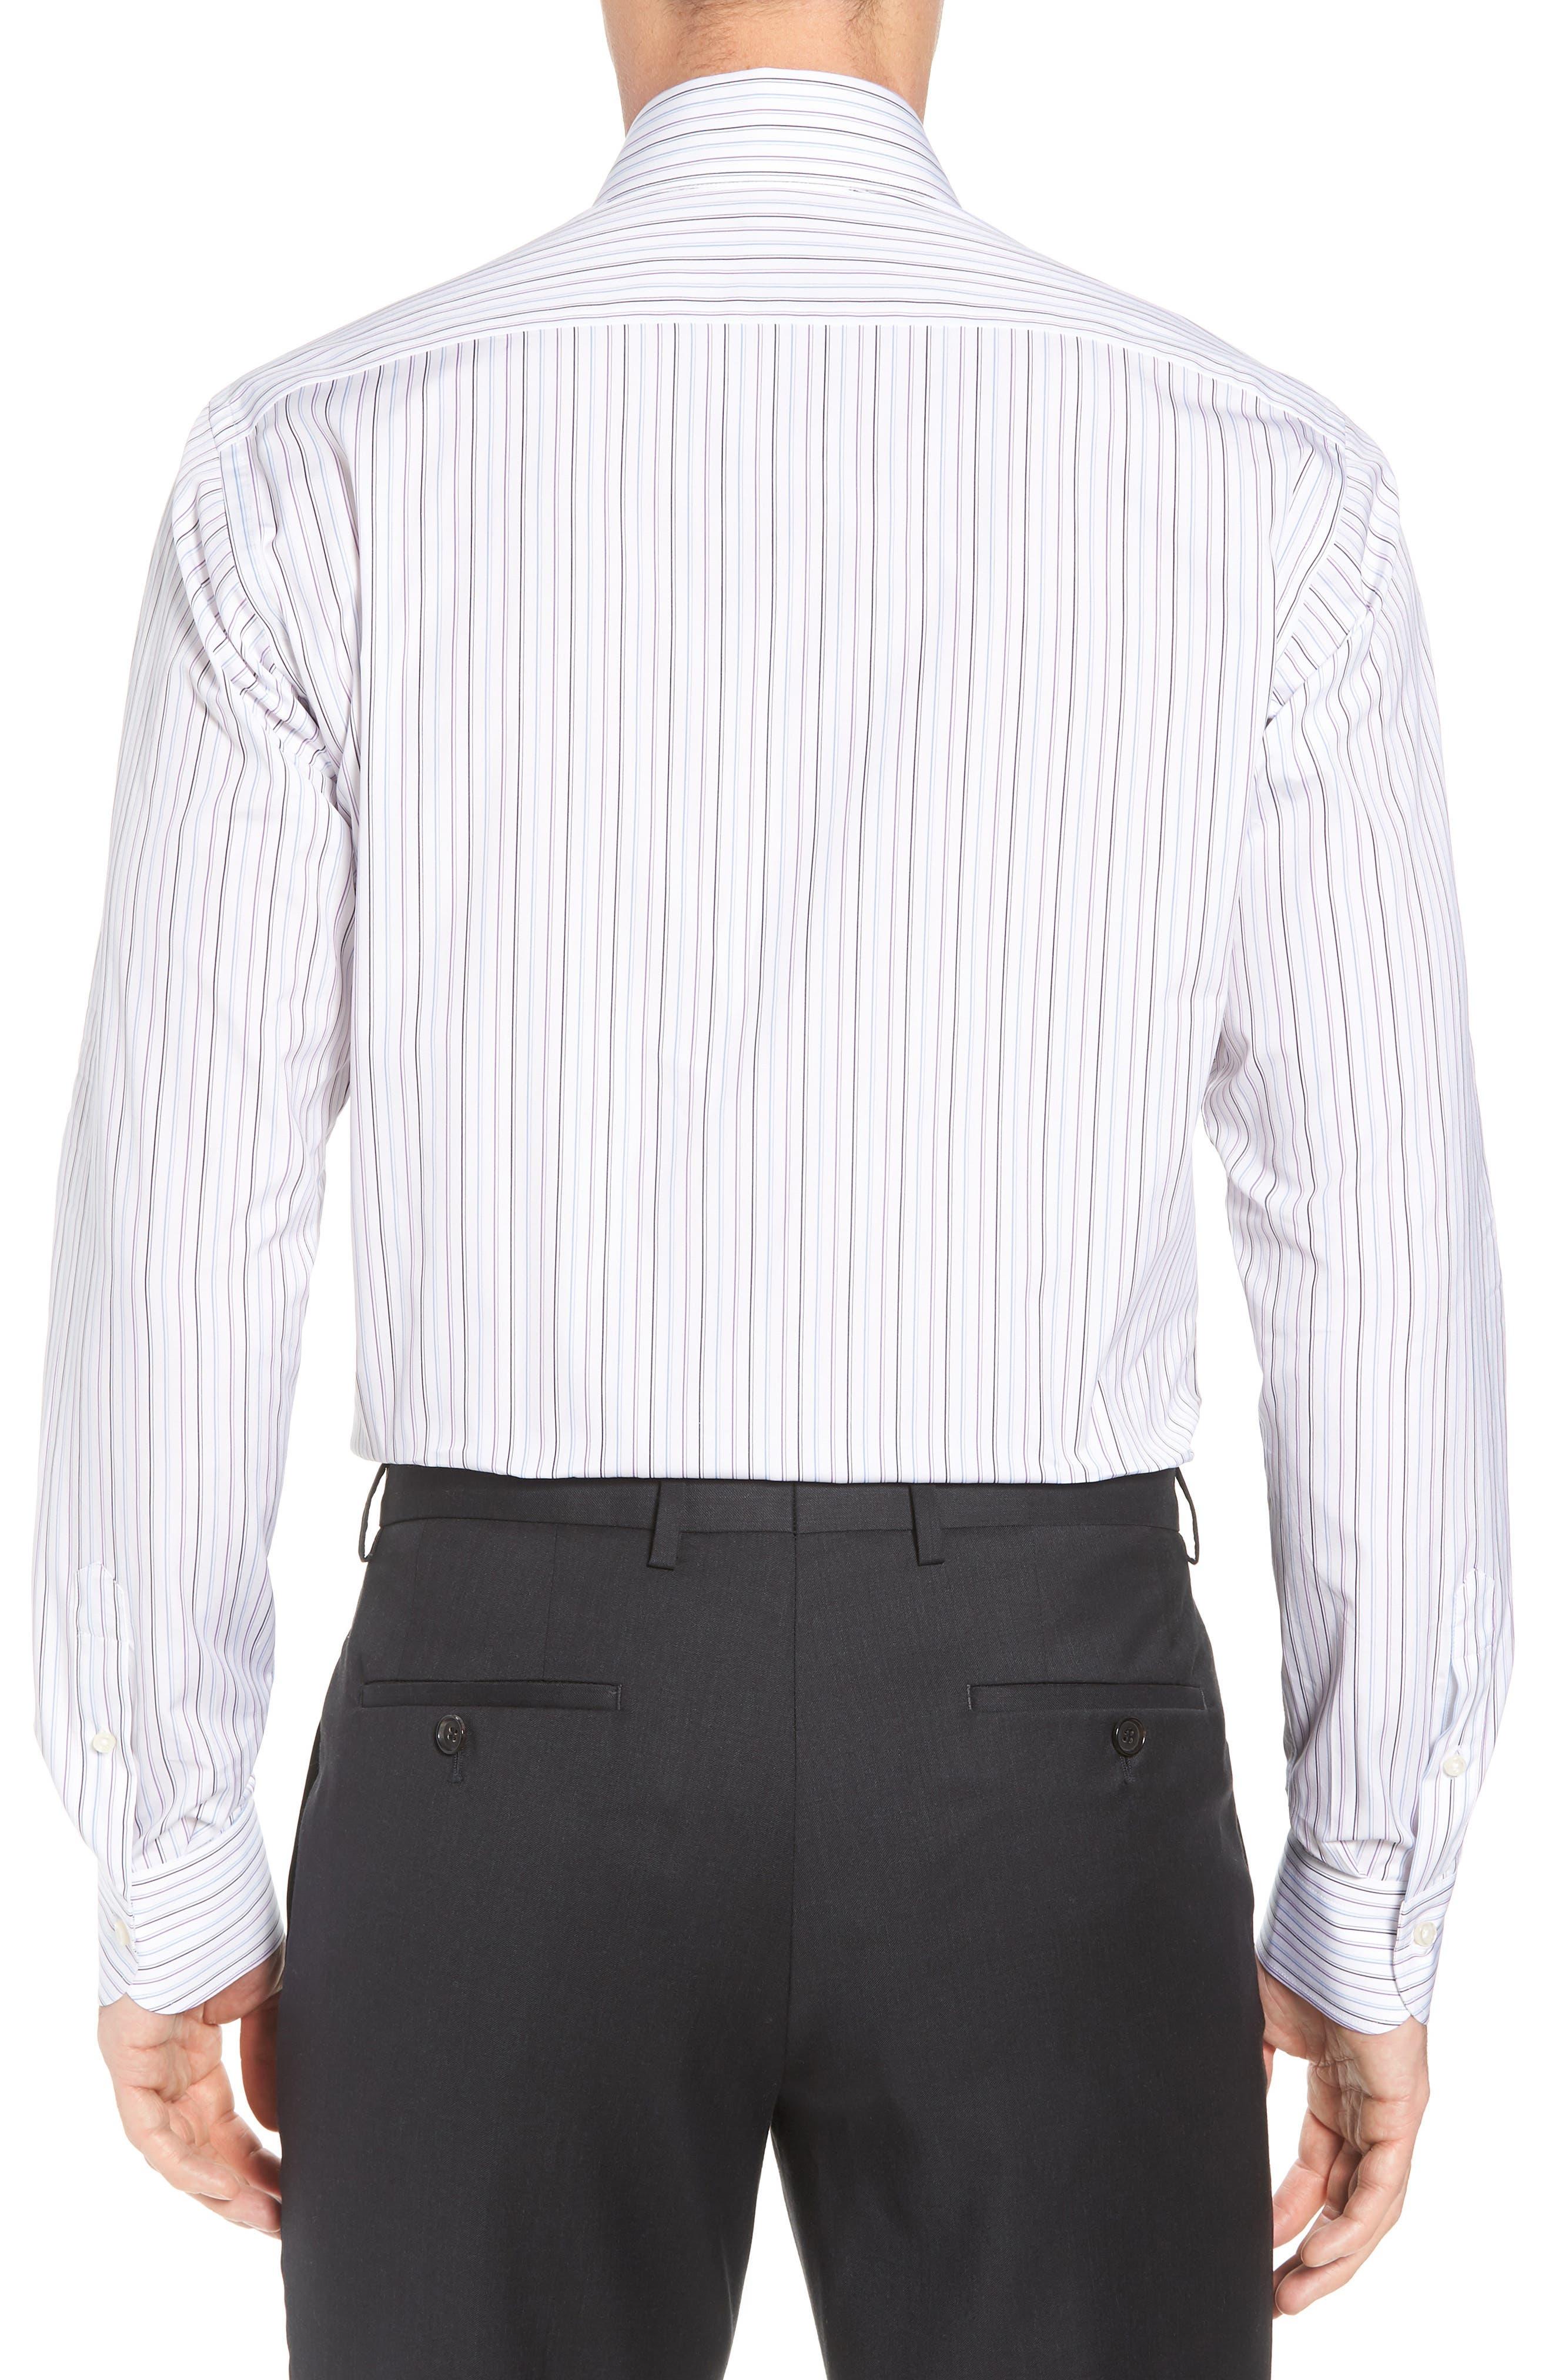 Regular Fit Stripe Dress Shirt,                             Alternate thumbnail 3, color,                             WHITE/ BLUE/ PURPLE